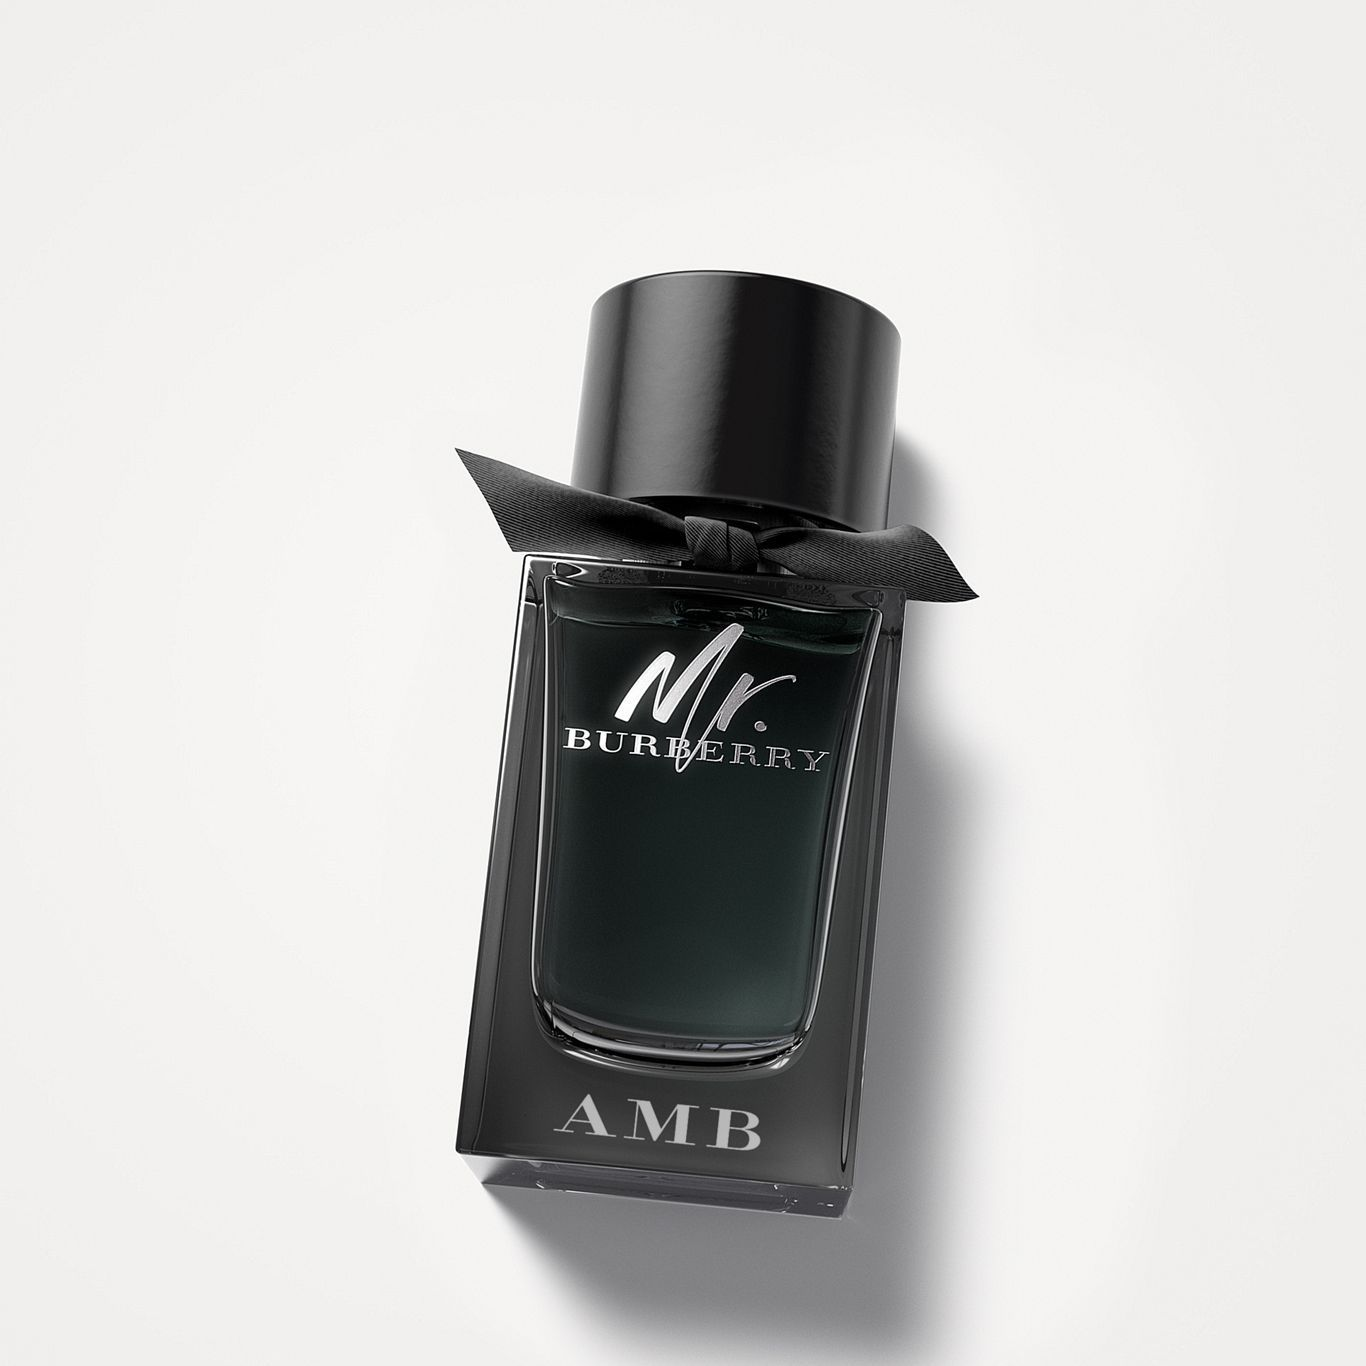 Mr Burberry Edp Perfume 100ml For Men Mr Burberry Eau De Parfum Is An Intense Interpretation Of The Original Mr Burber Perfume Fragrance Burberry Perfume